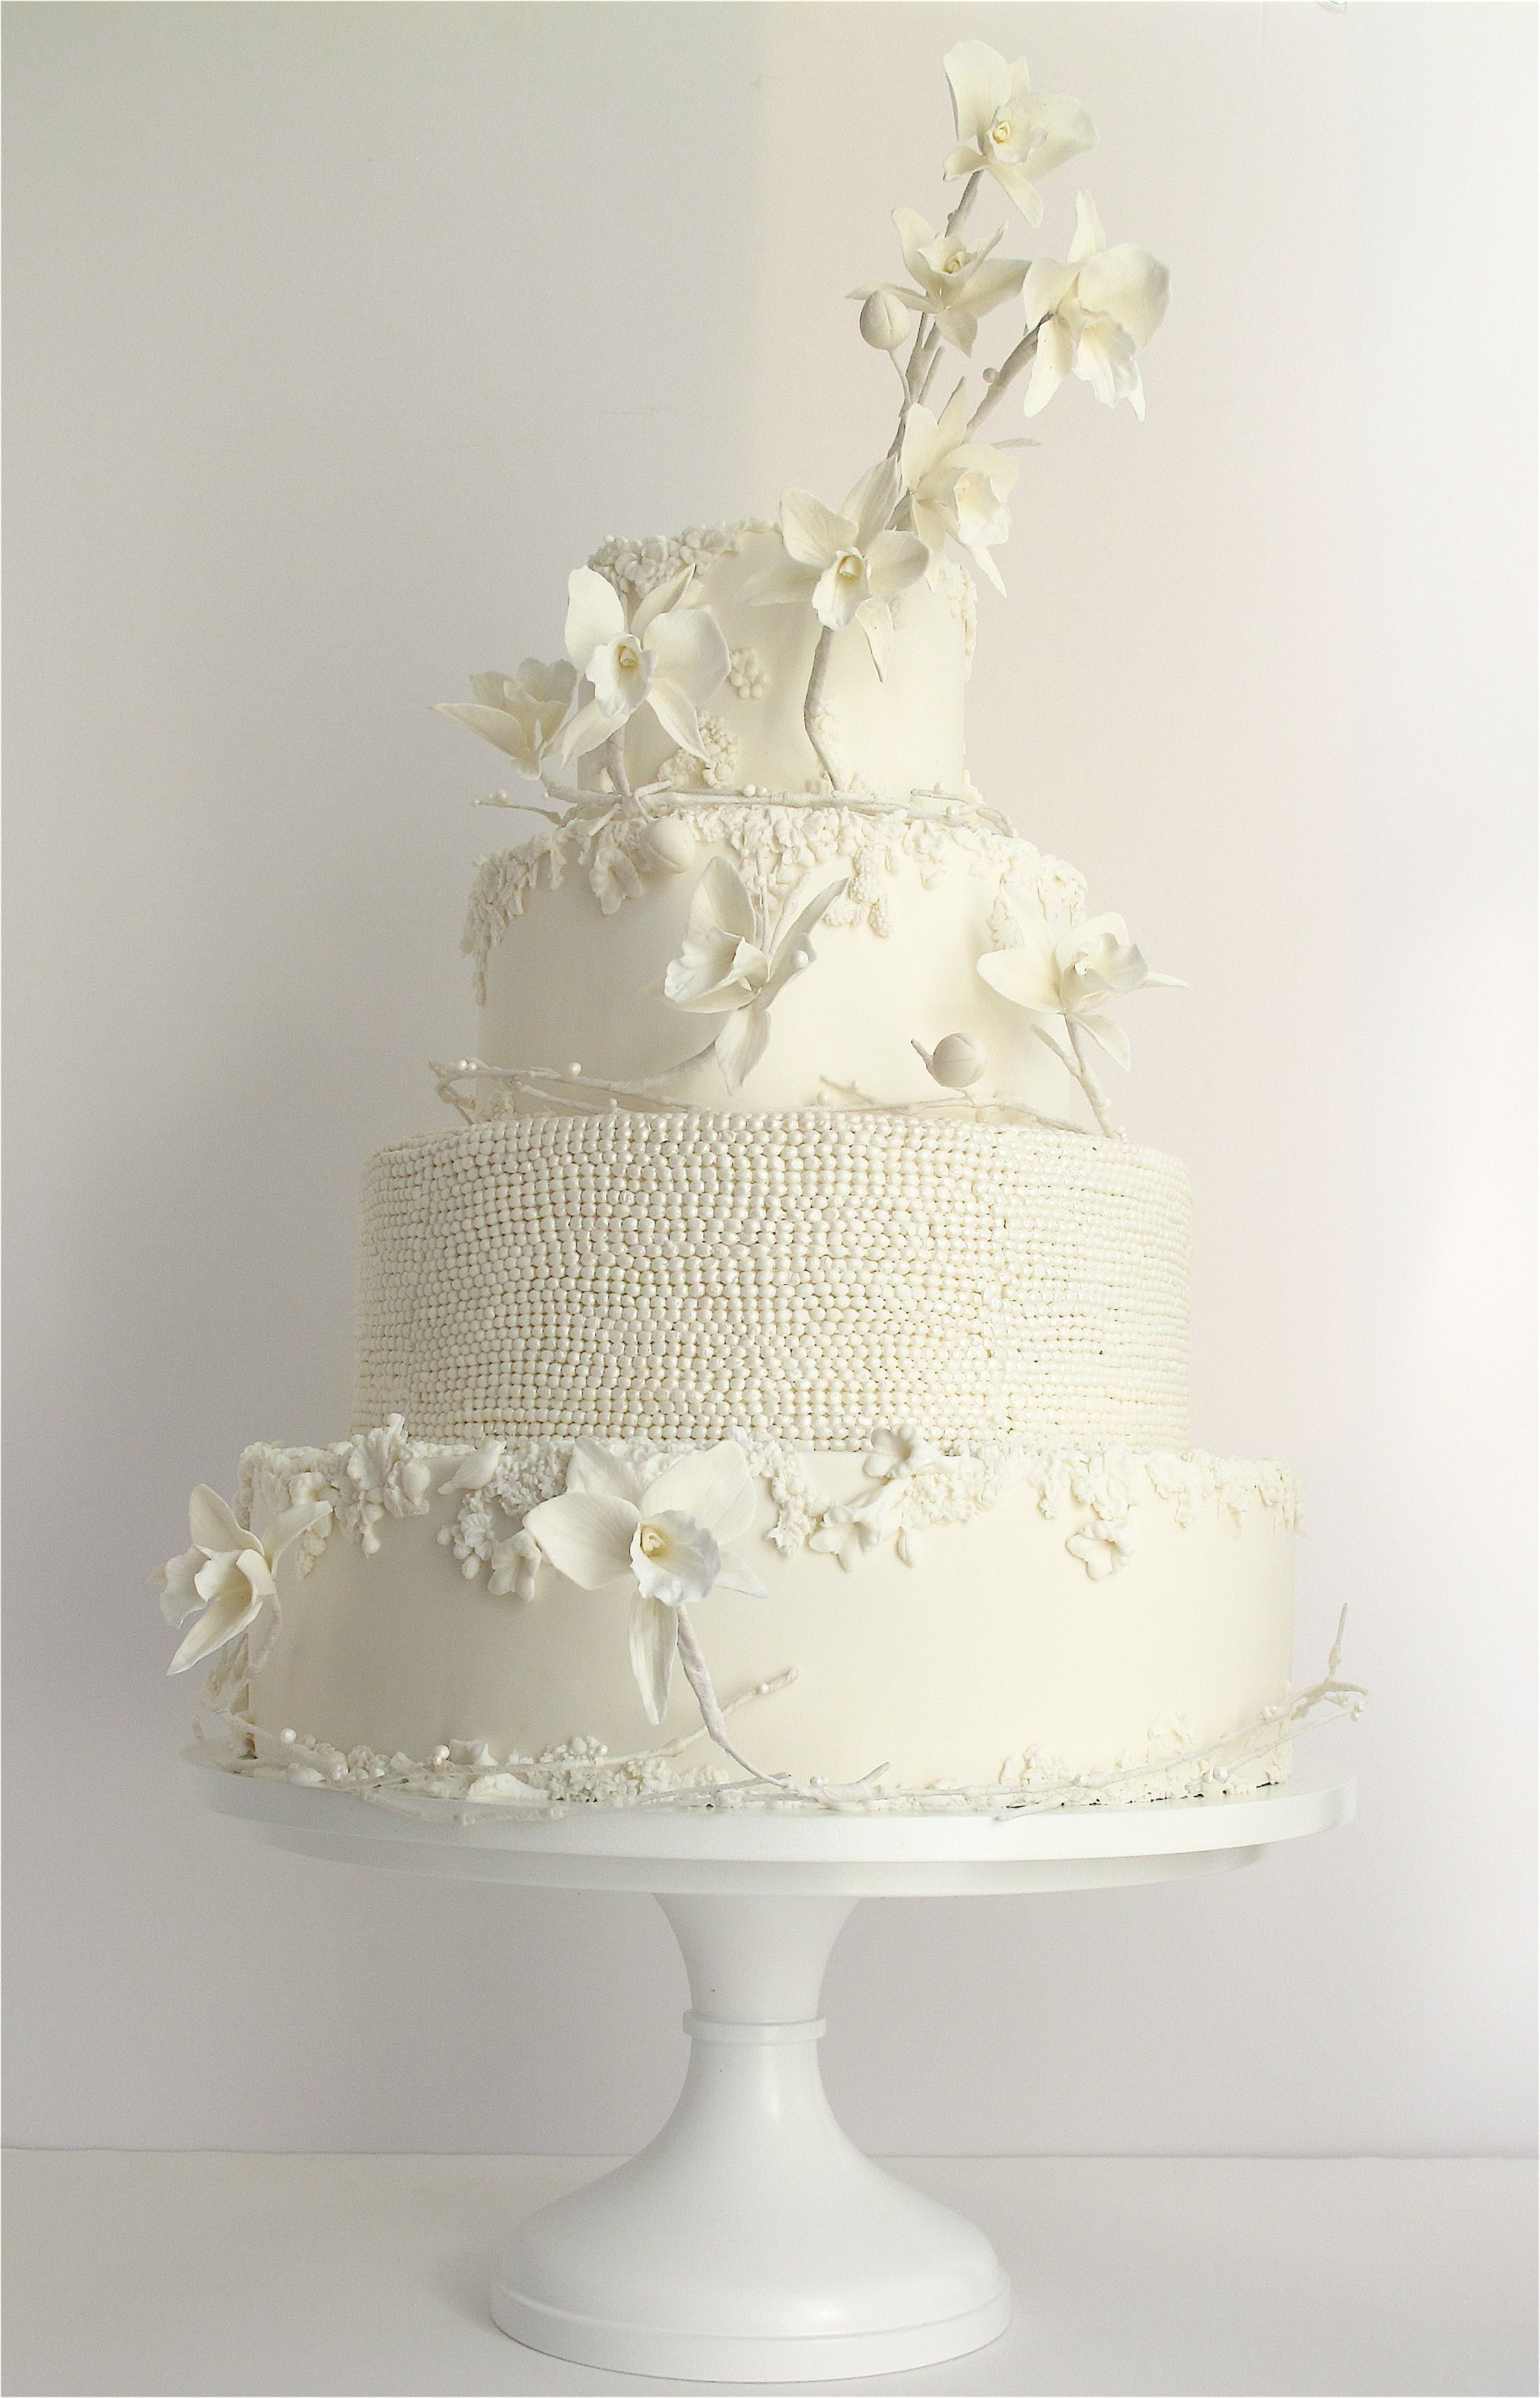 maggie austin cake white orchid cake